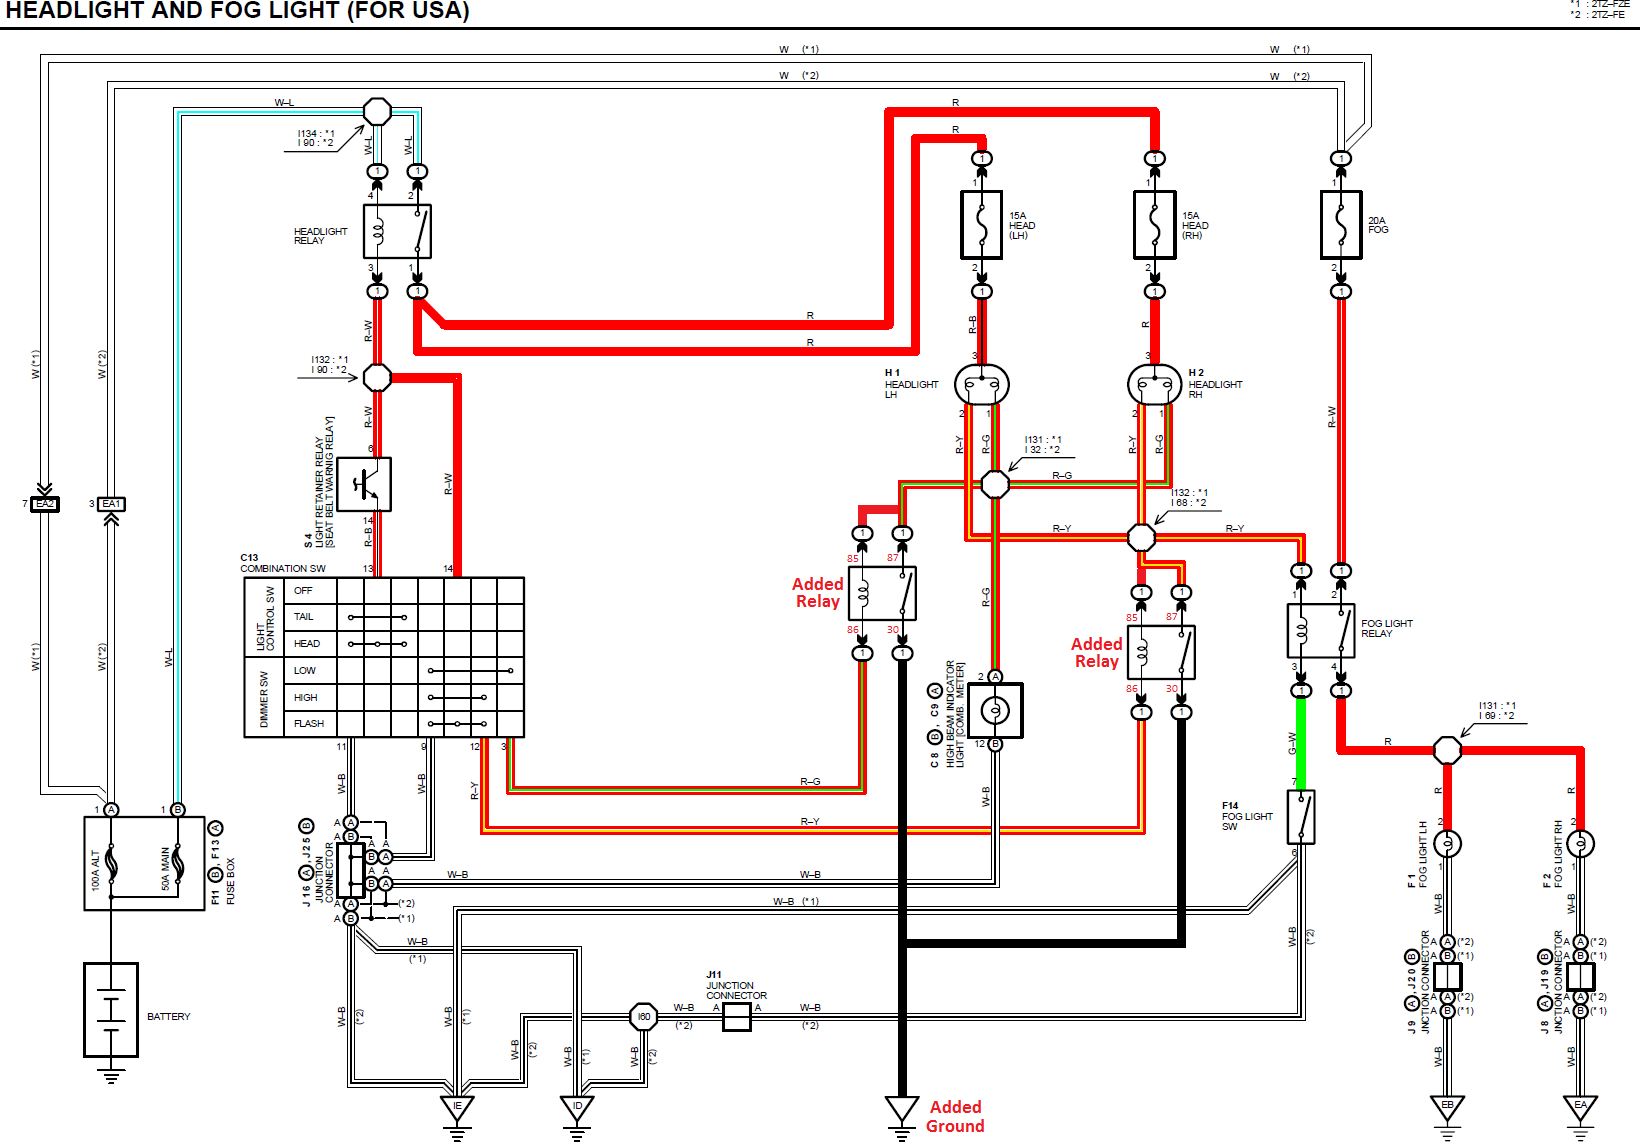 Toyota Headlight Wiring Diagram Wiring Diagram Web A Web A Reteimpresesabina It